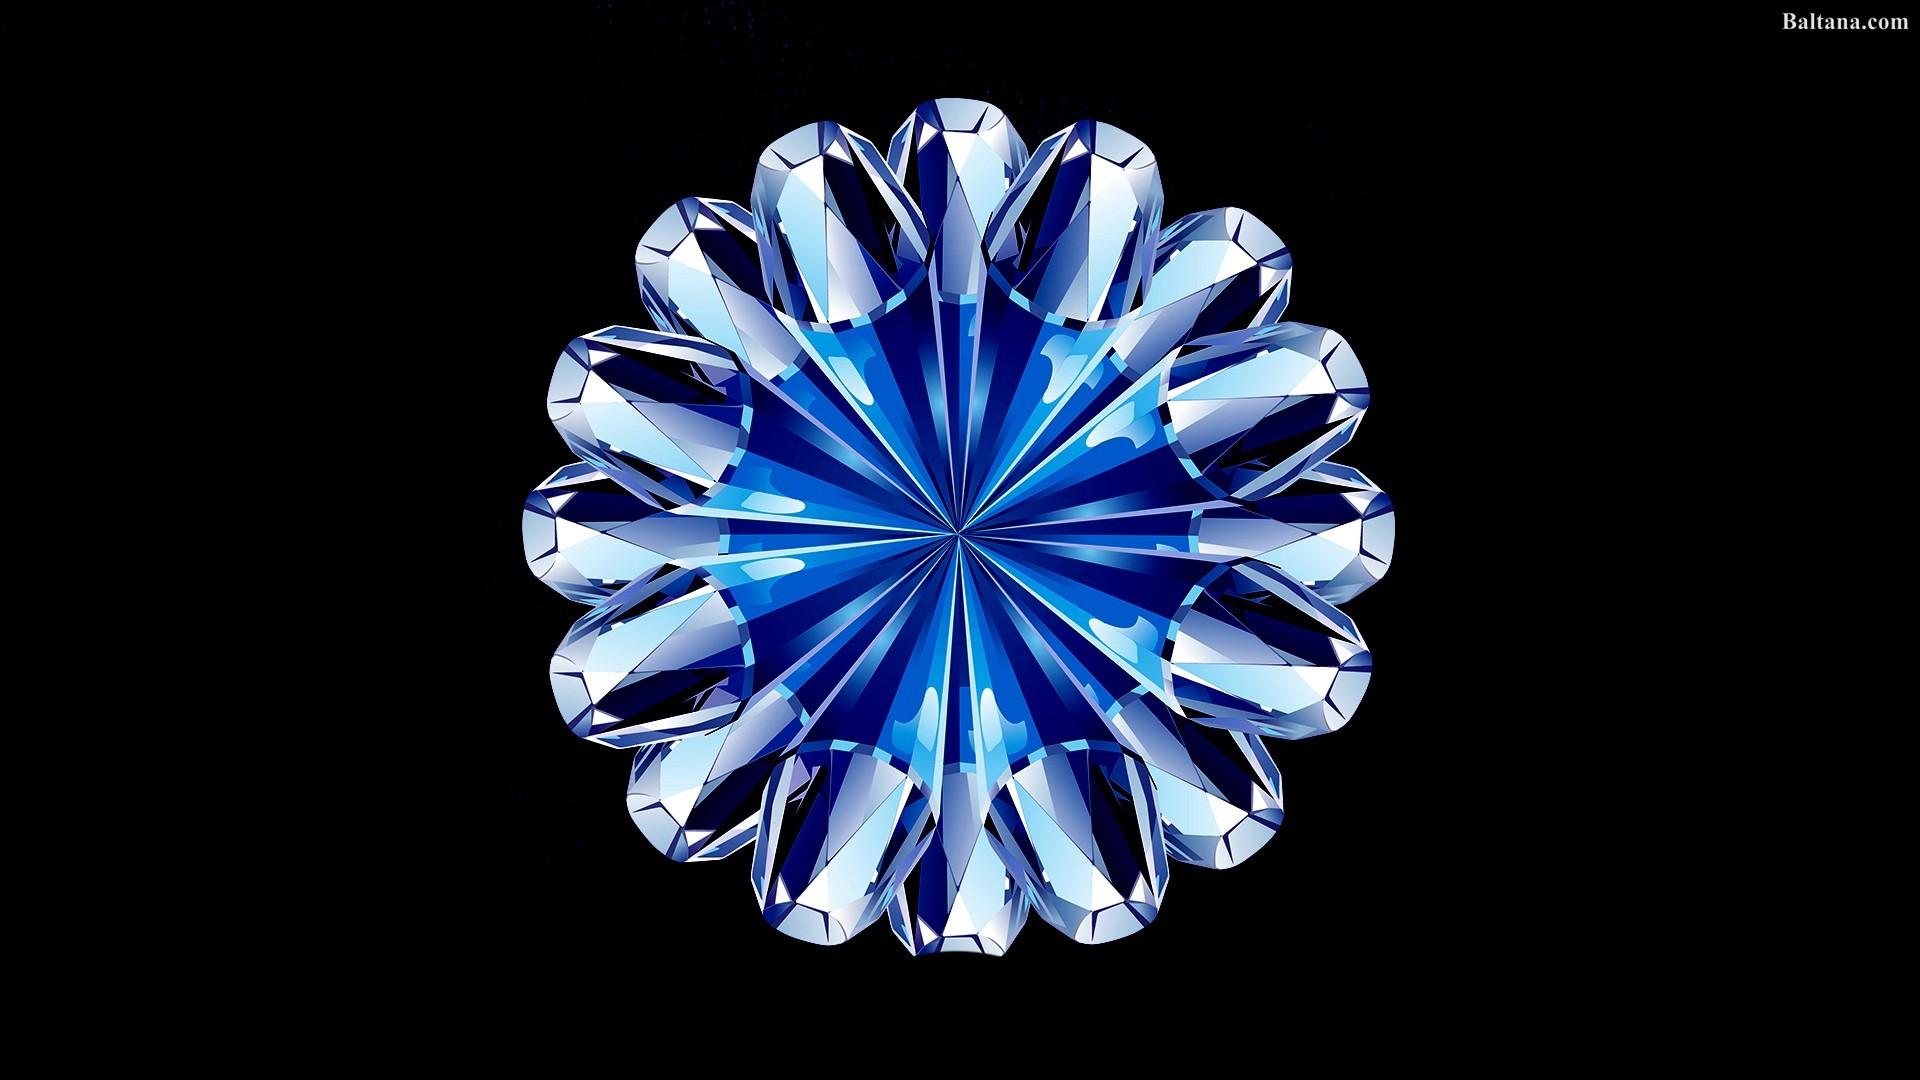 Res: 1920x1080, Diamond Wallpaper 30300